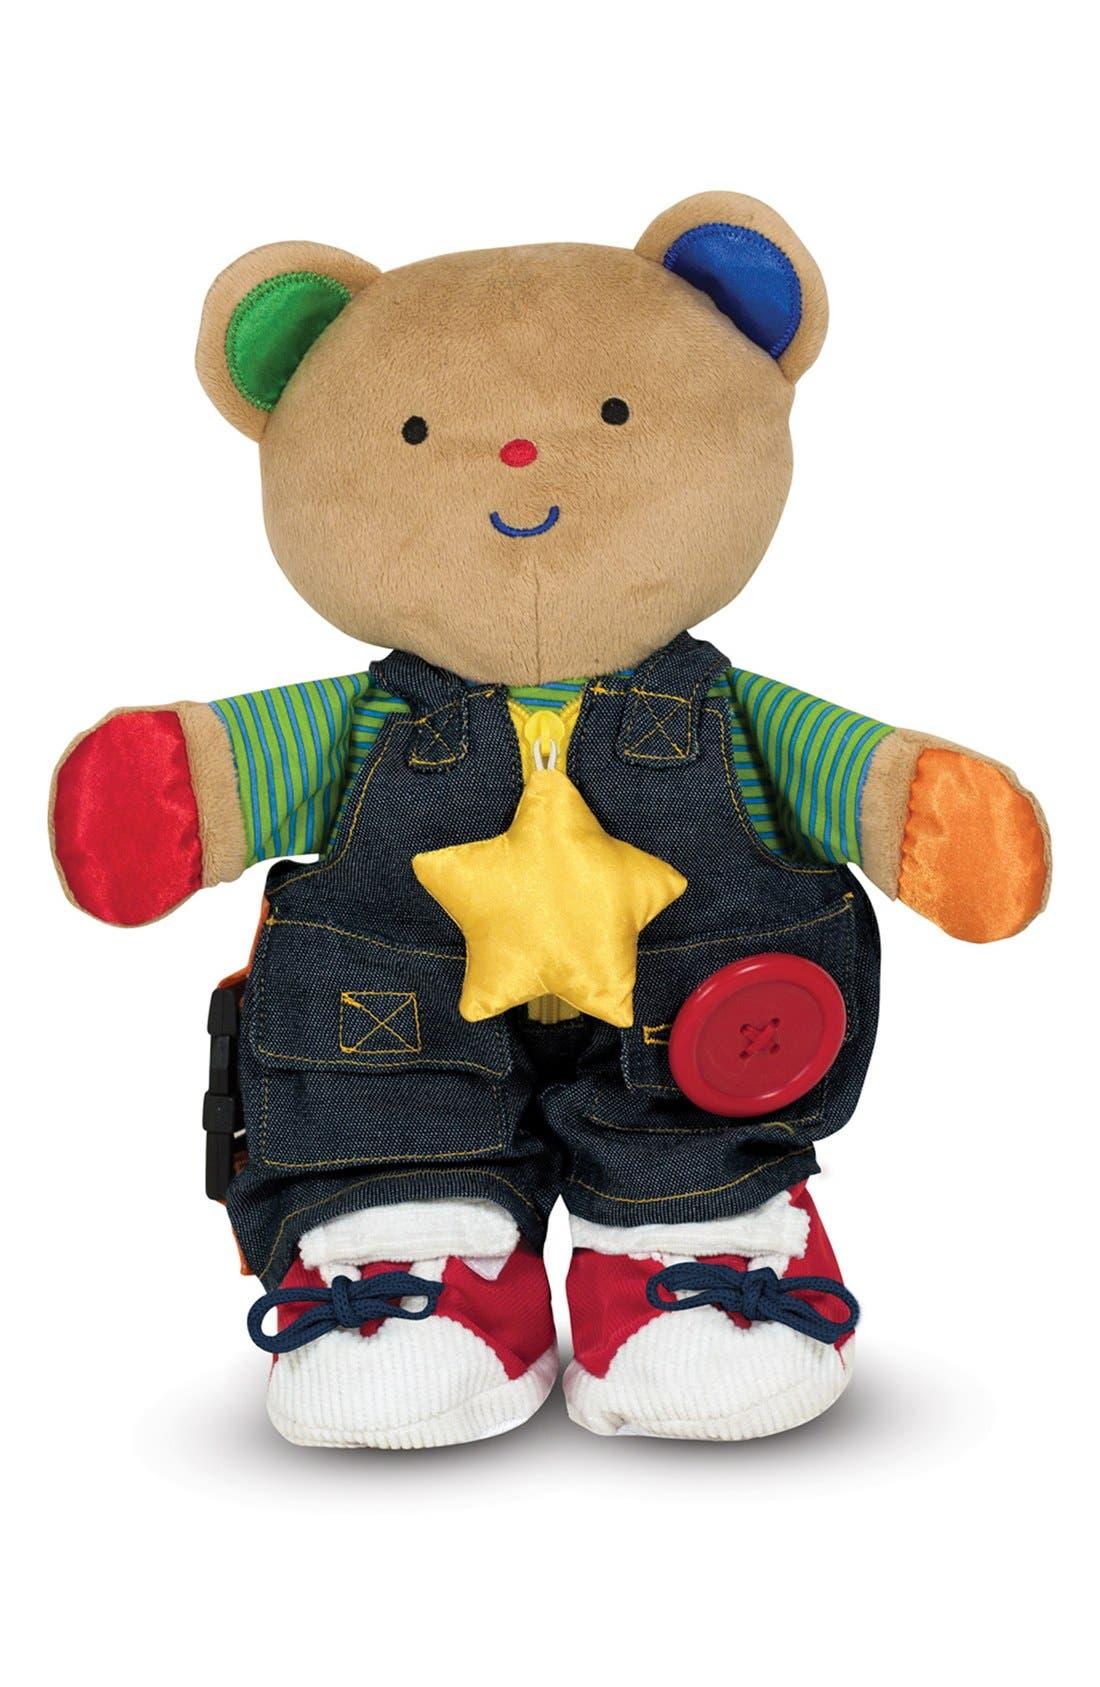 Melissa & Doug 'Teddy Wear' Plush Toy